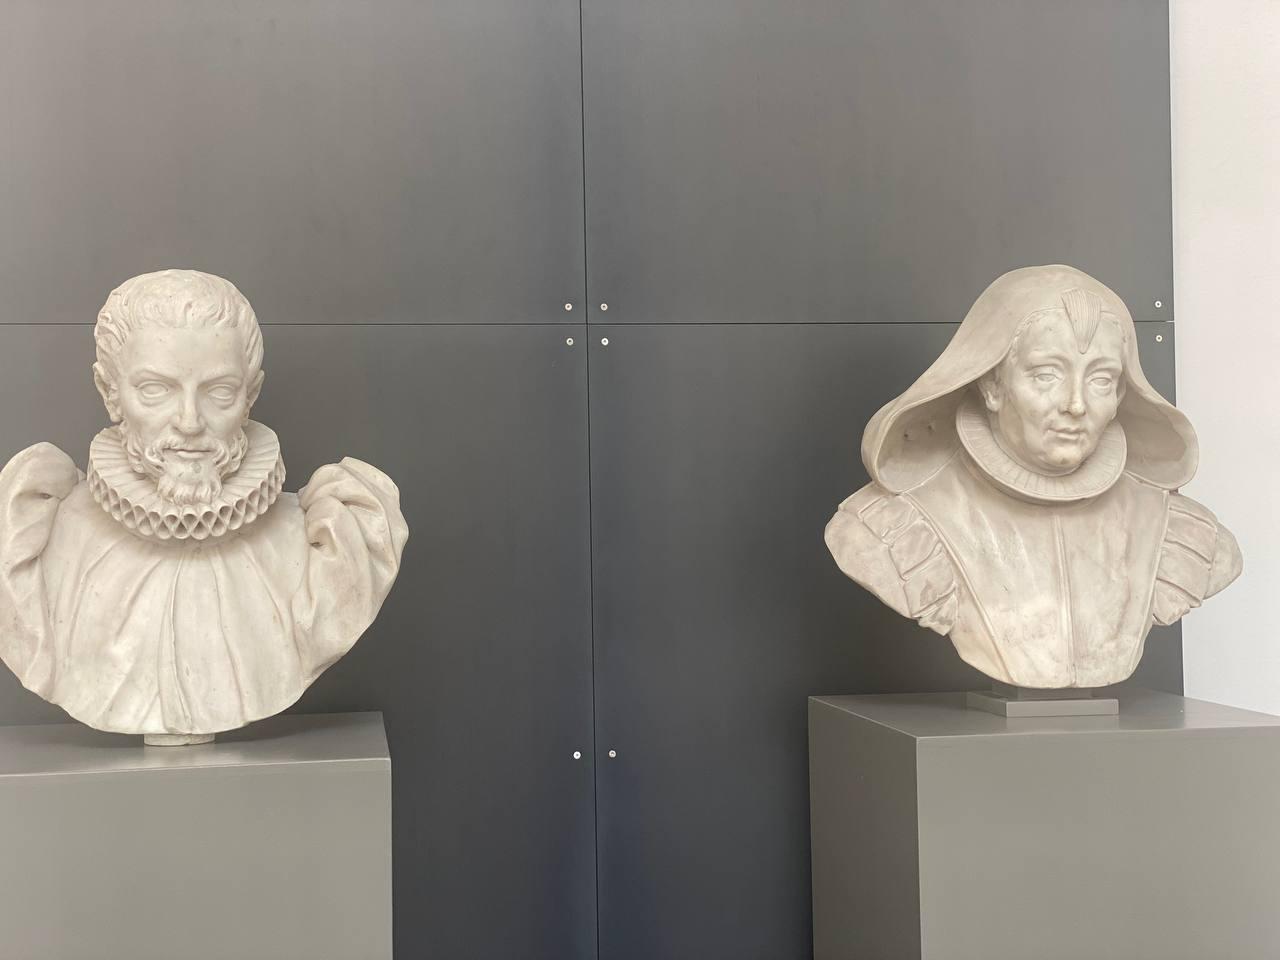 I due busti dei coniugi Genitle